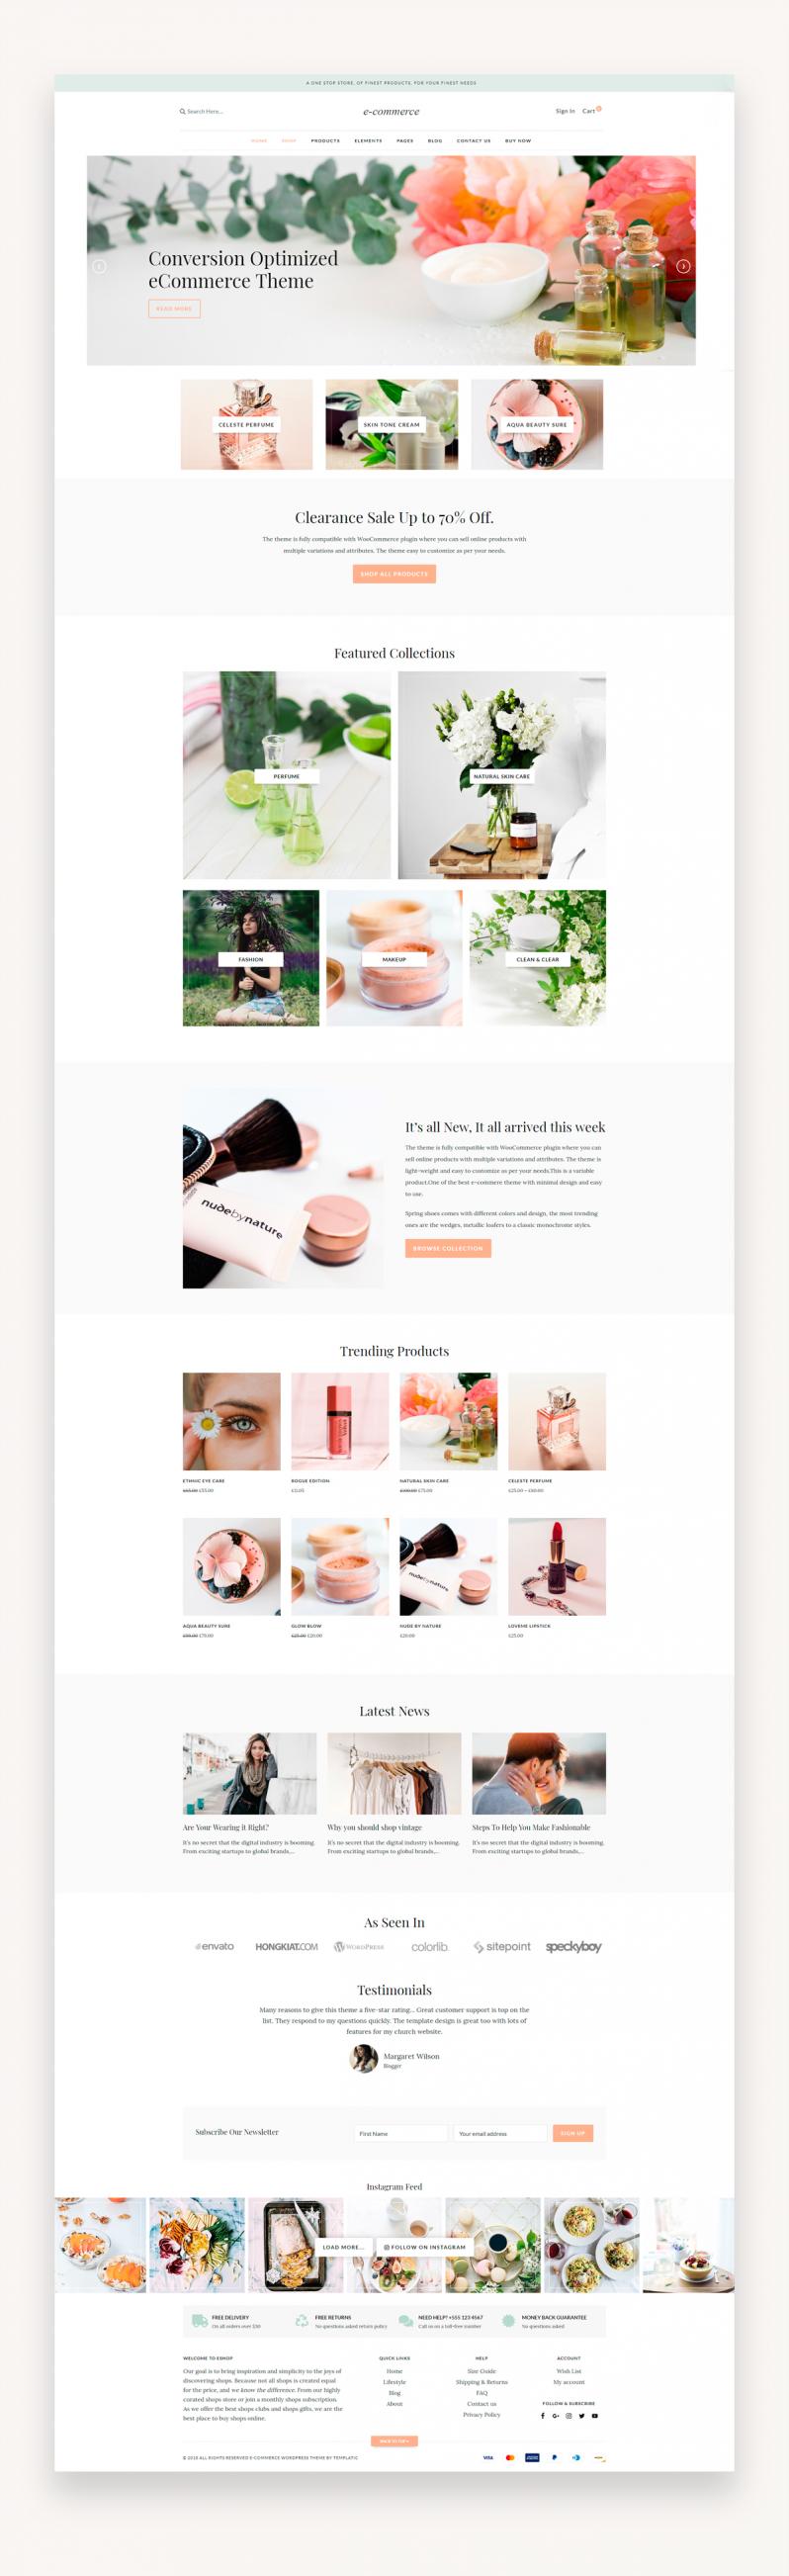 eCommerce - Responsive eCommerce WordPress Theme